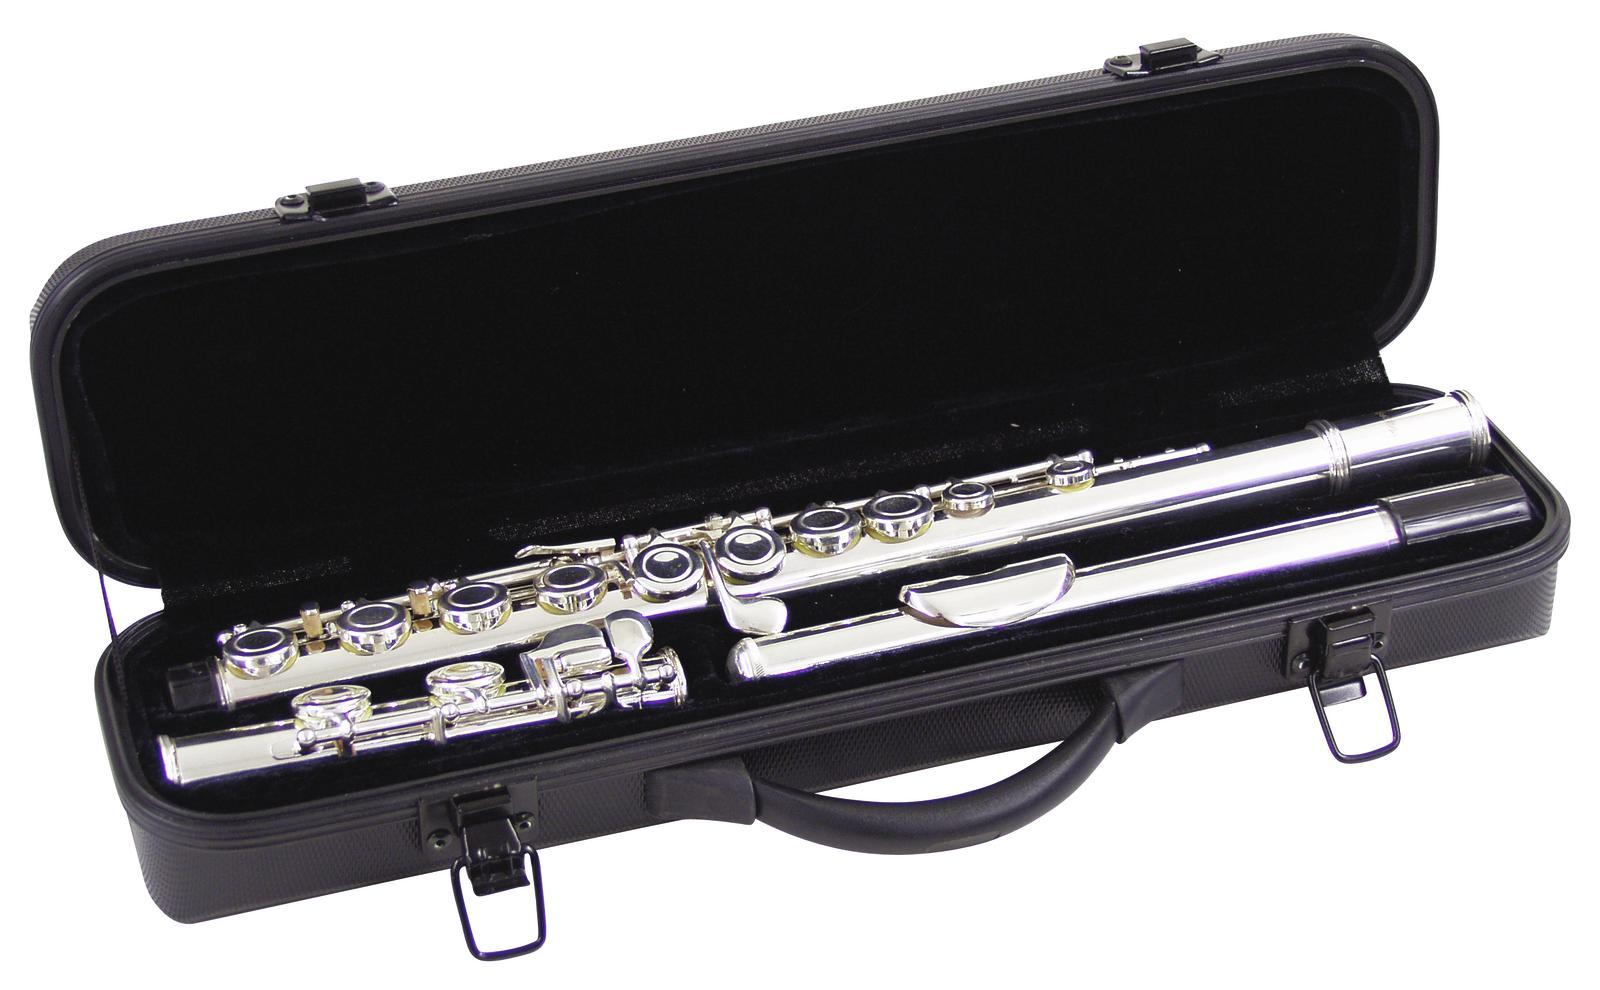 Flauto, placcato argento DIMAVERY QP-10 C